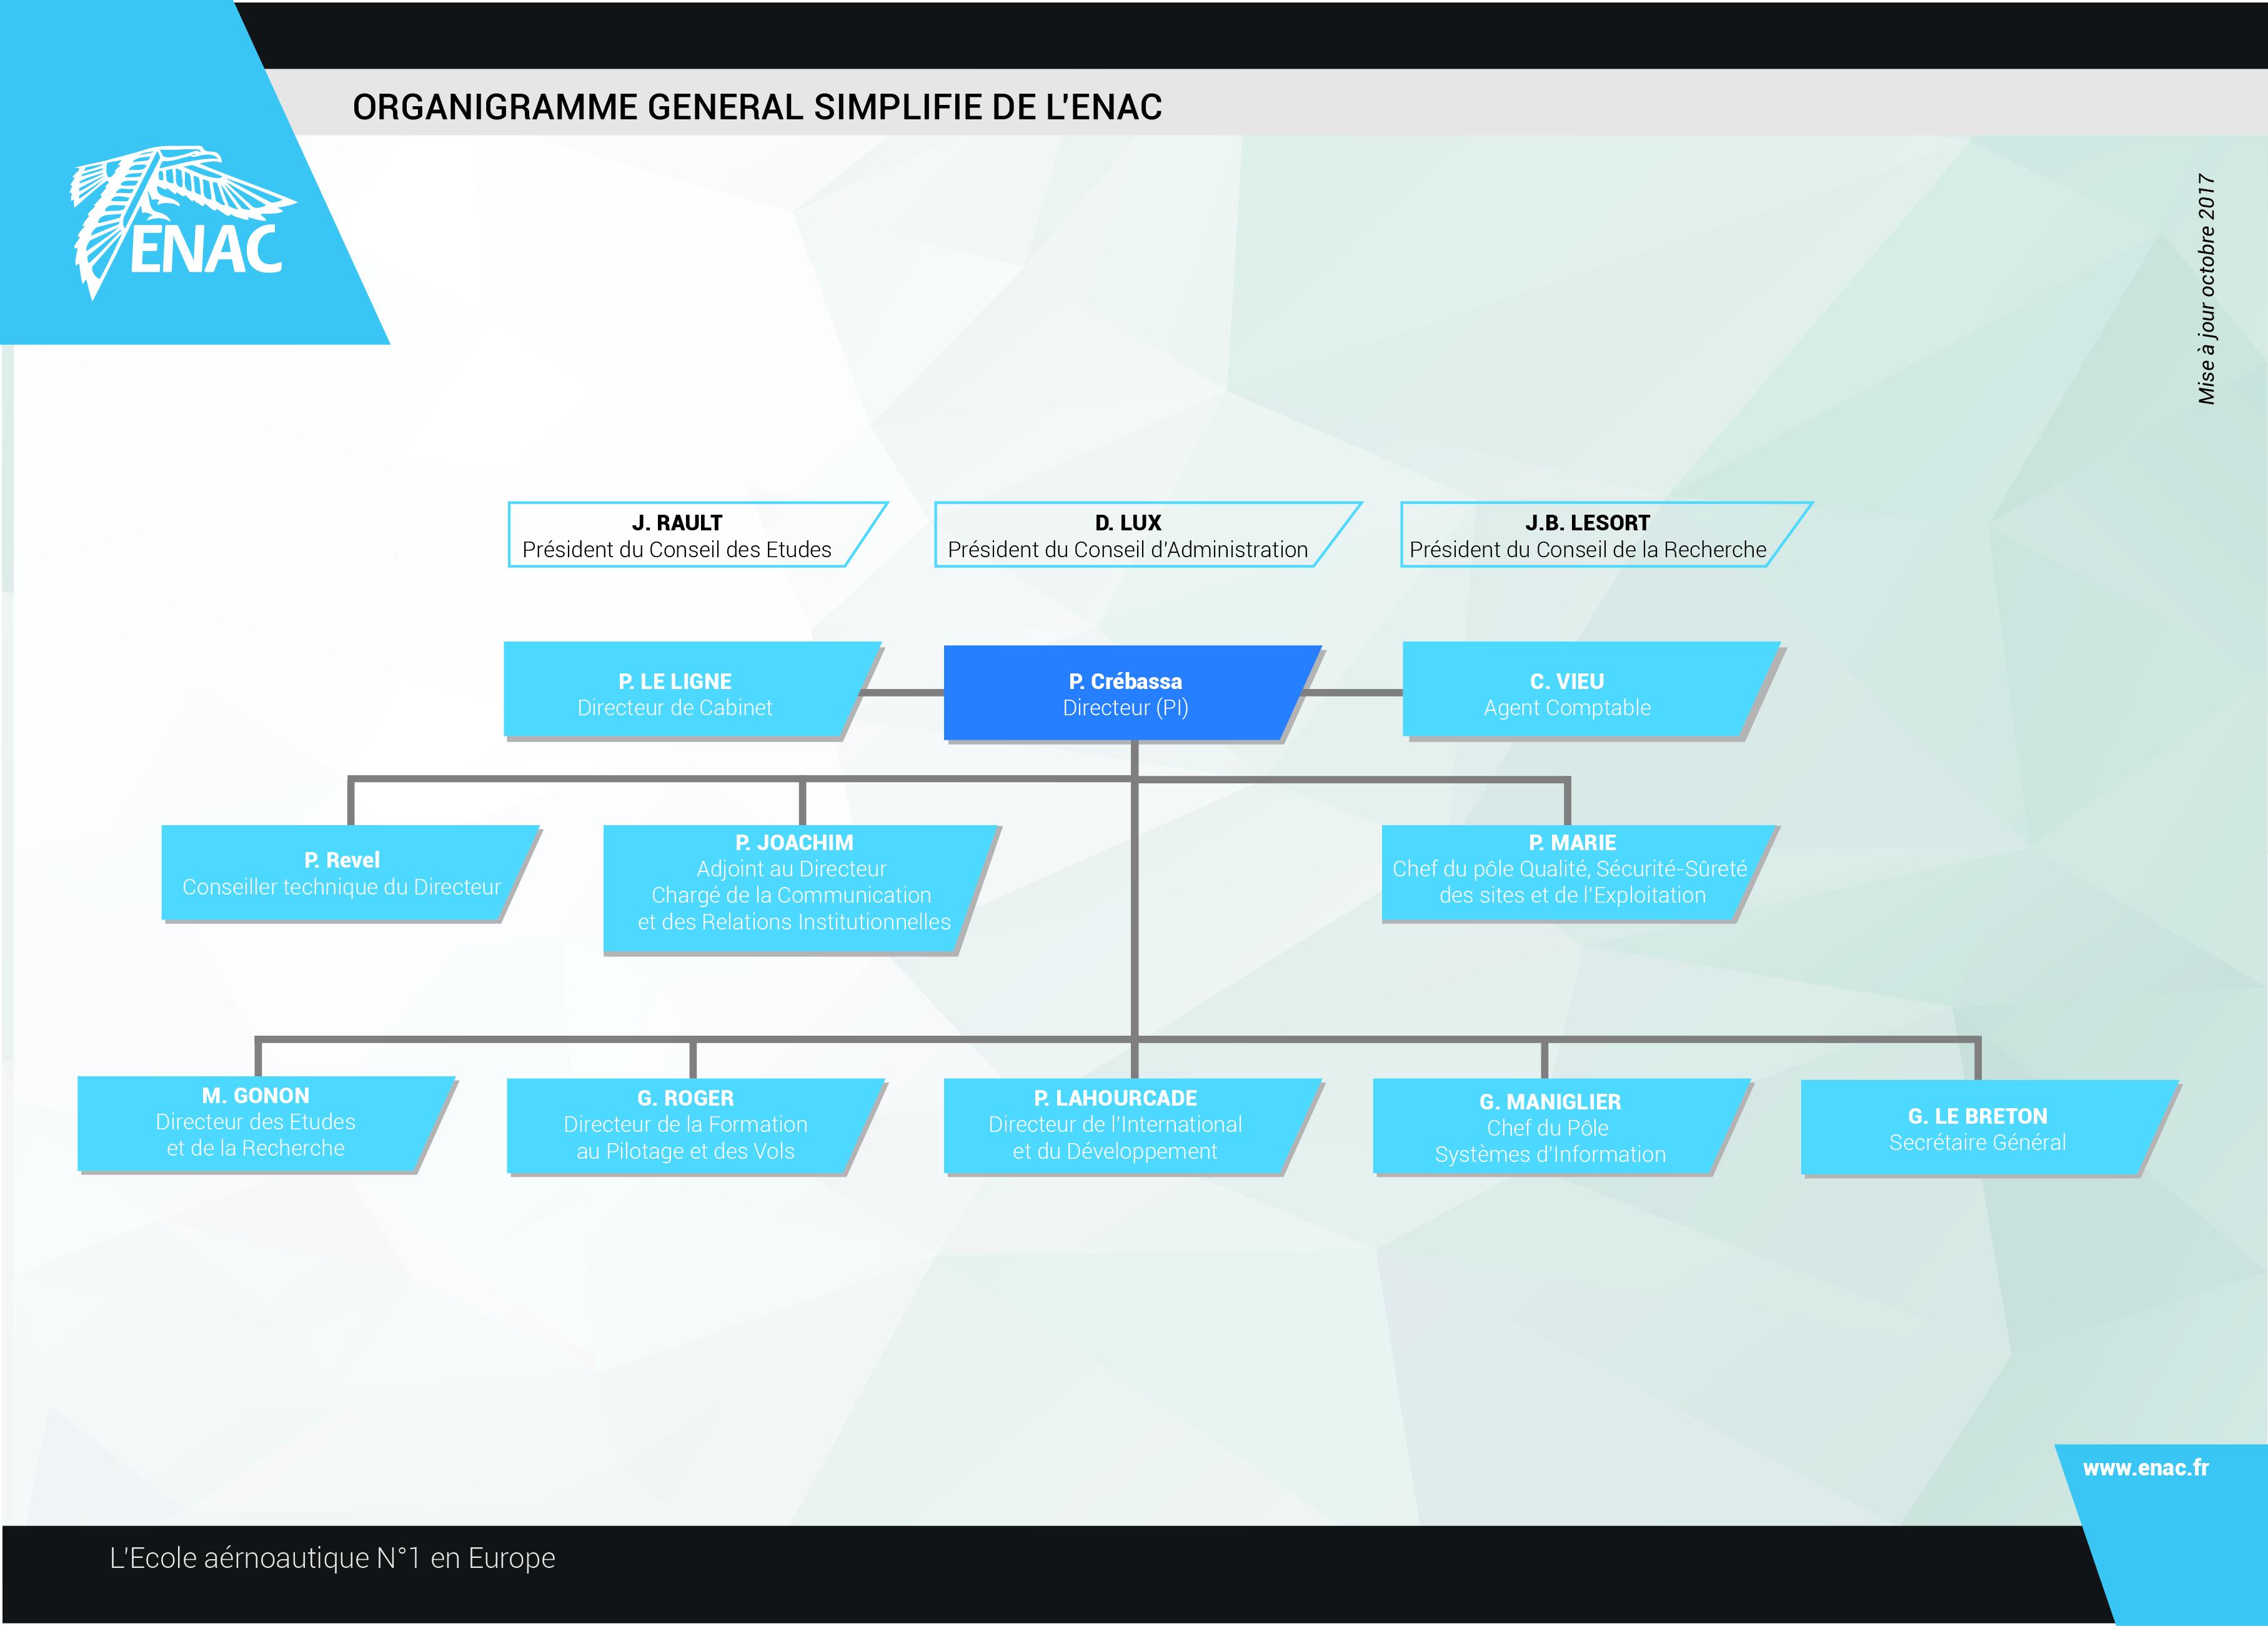 Organigramme général 2017